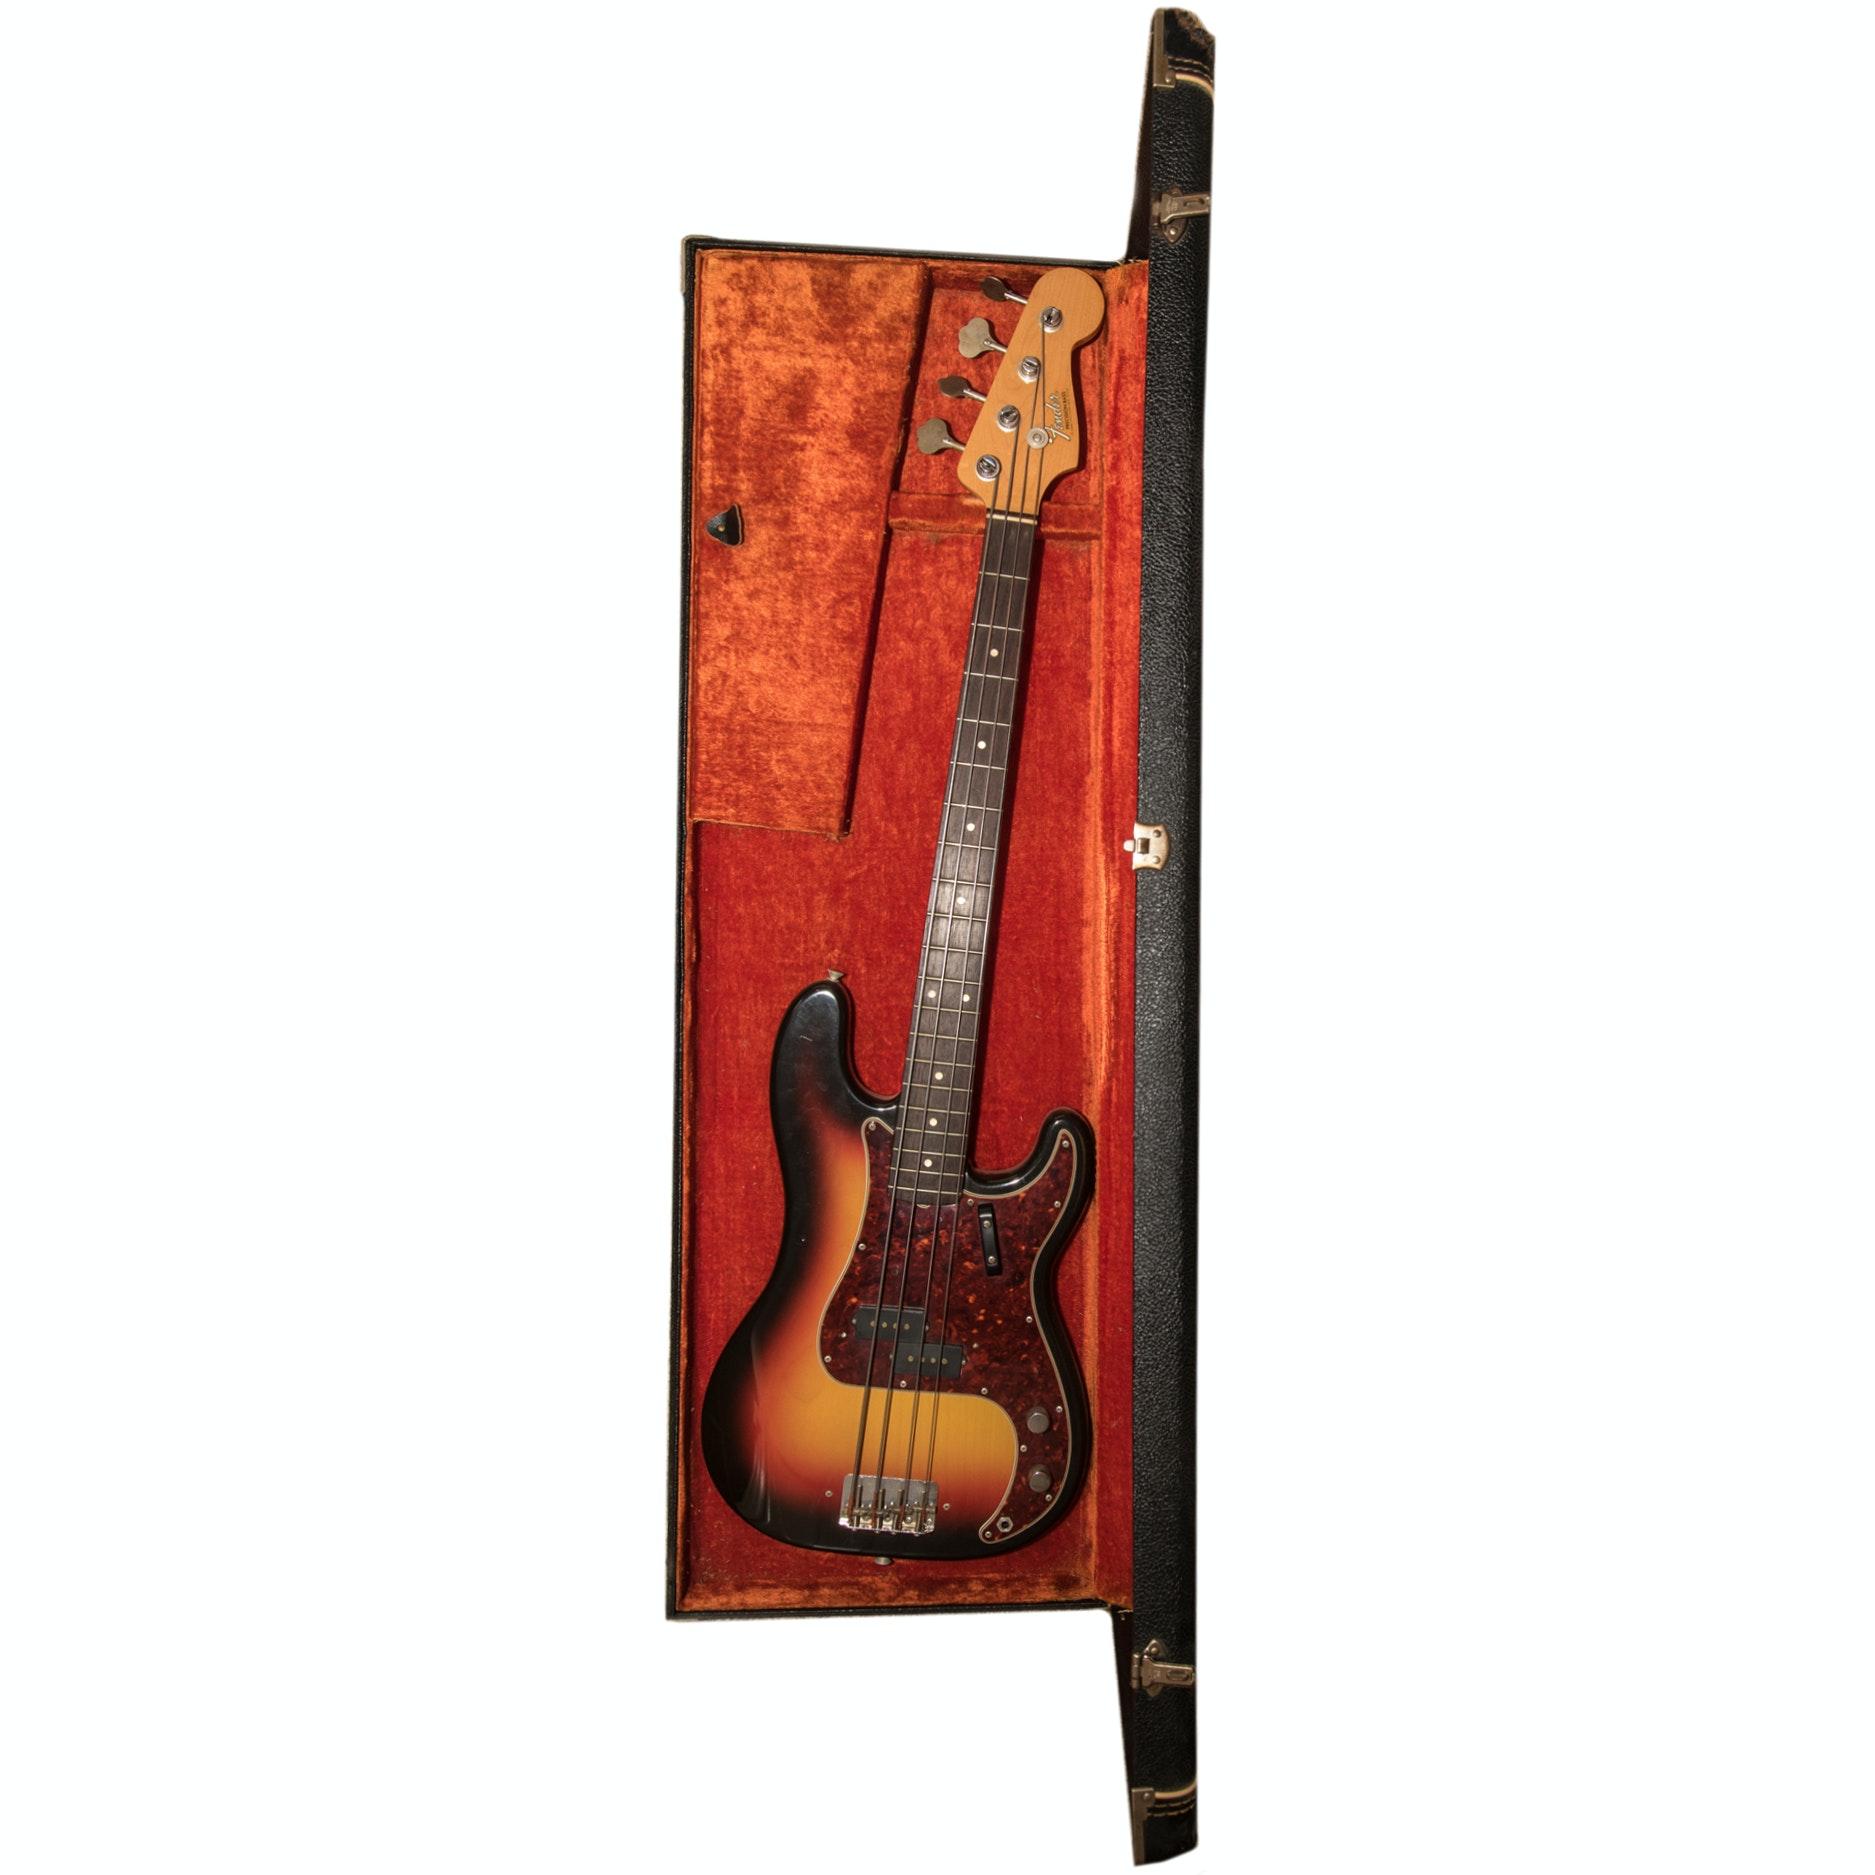 1966 Fender Precision Bass Guitar with Sunburst Finish